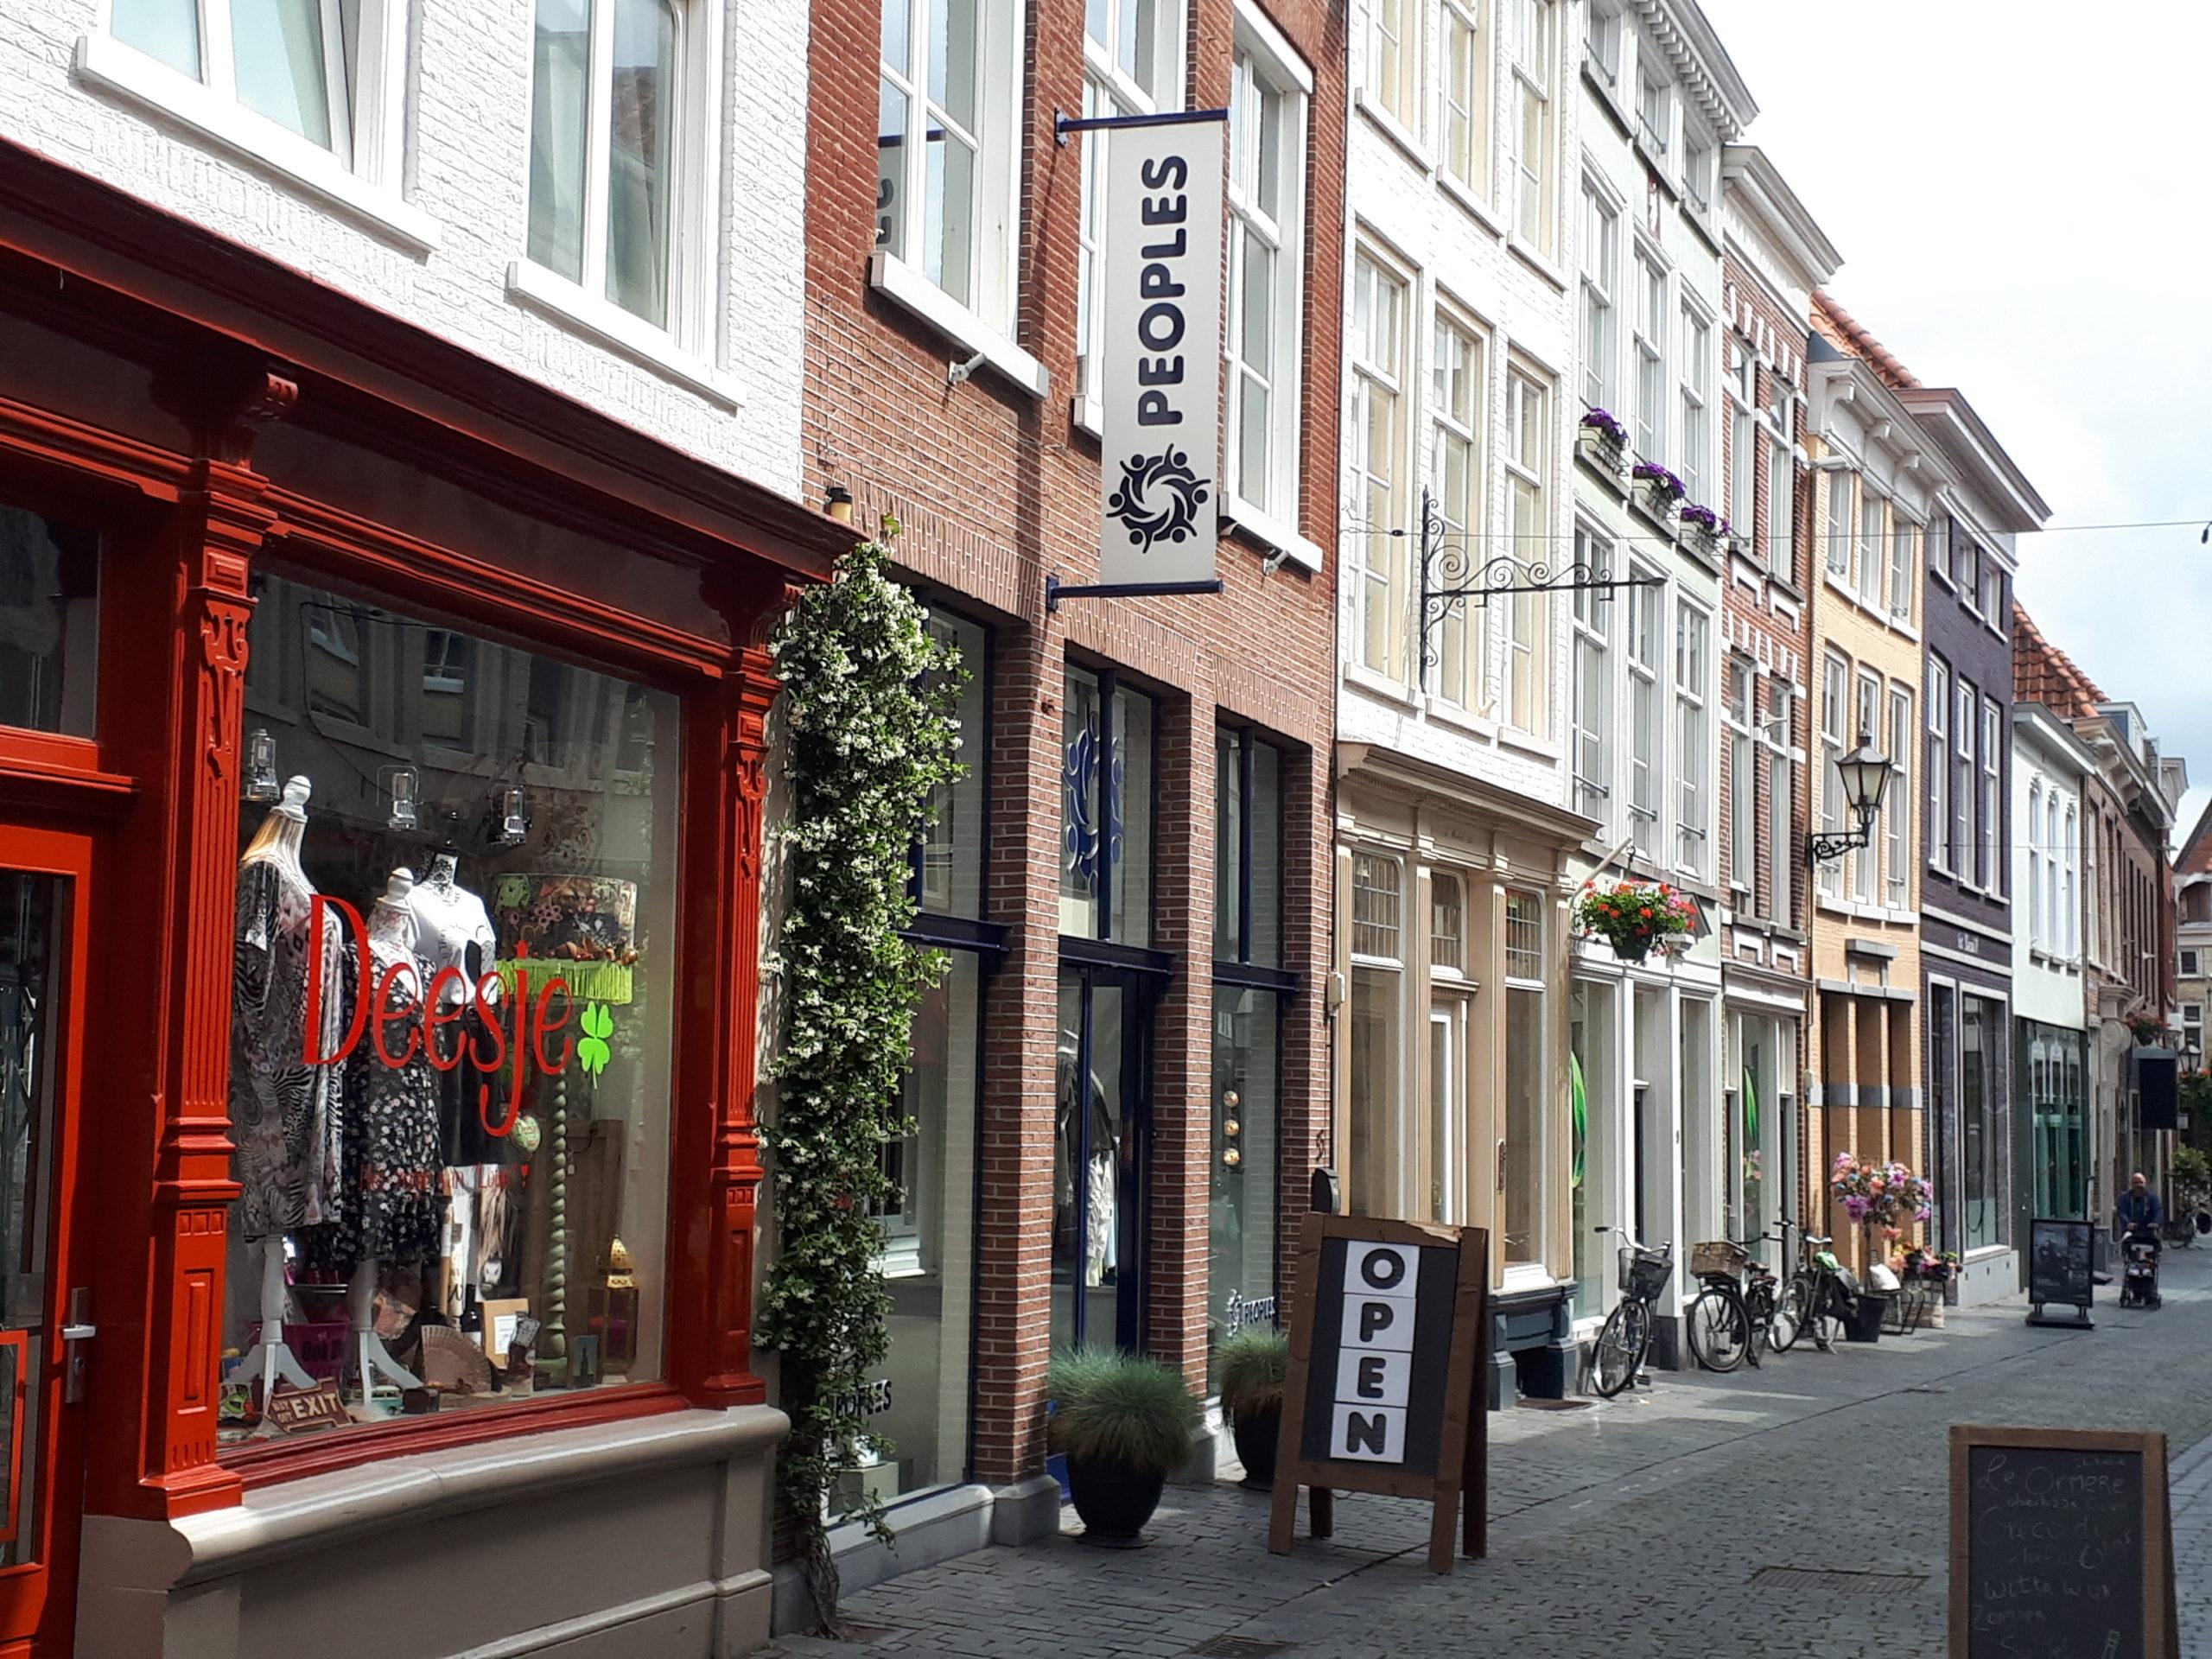 Peoples Bergen op Zoom kleding